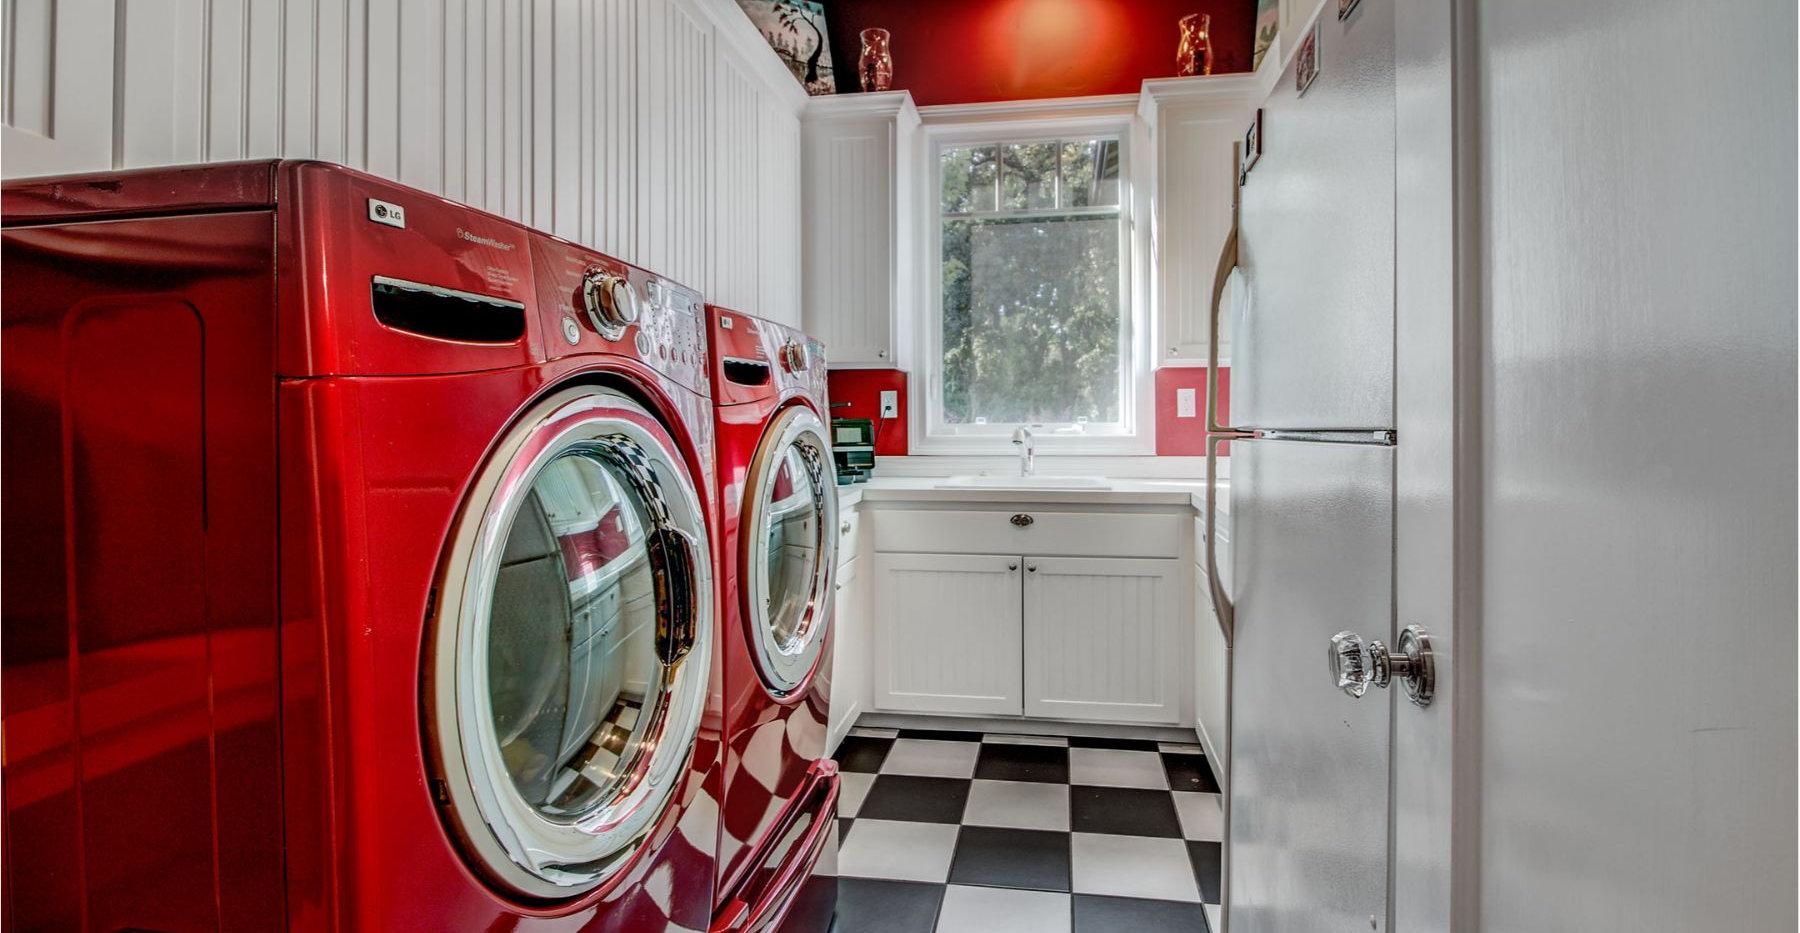 31 Laundry.jpg